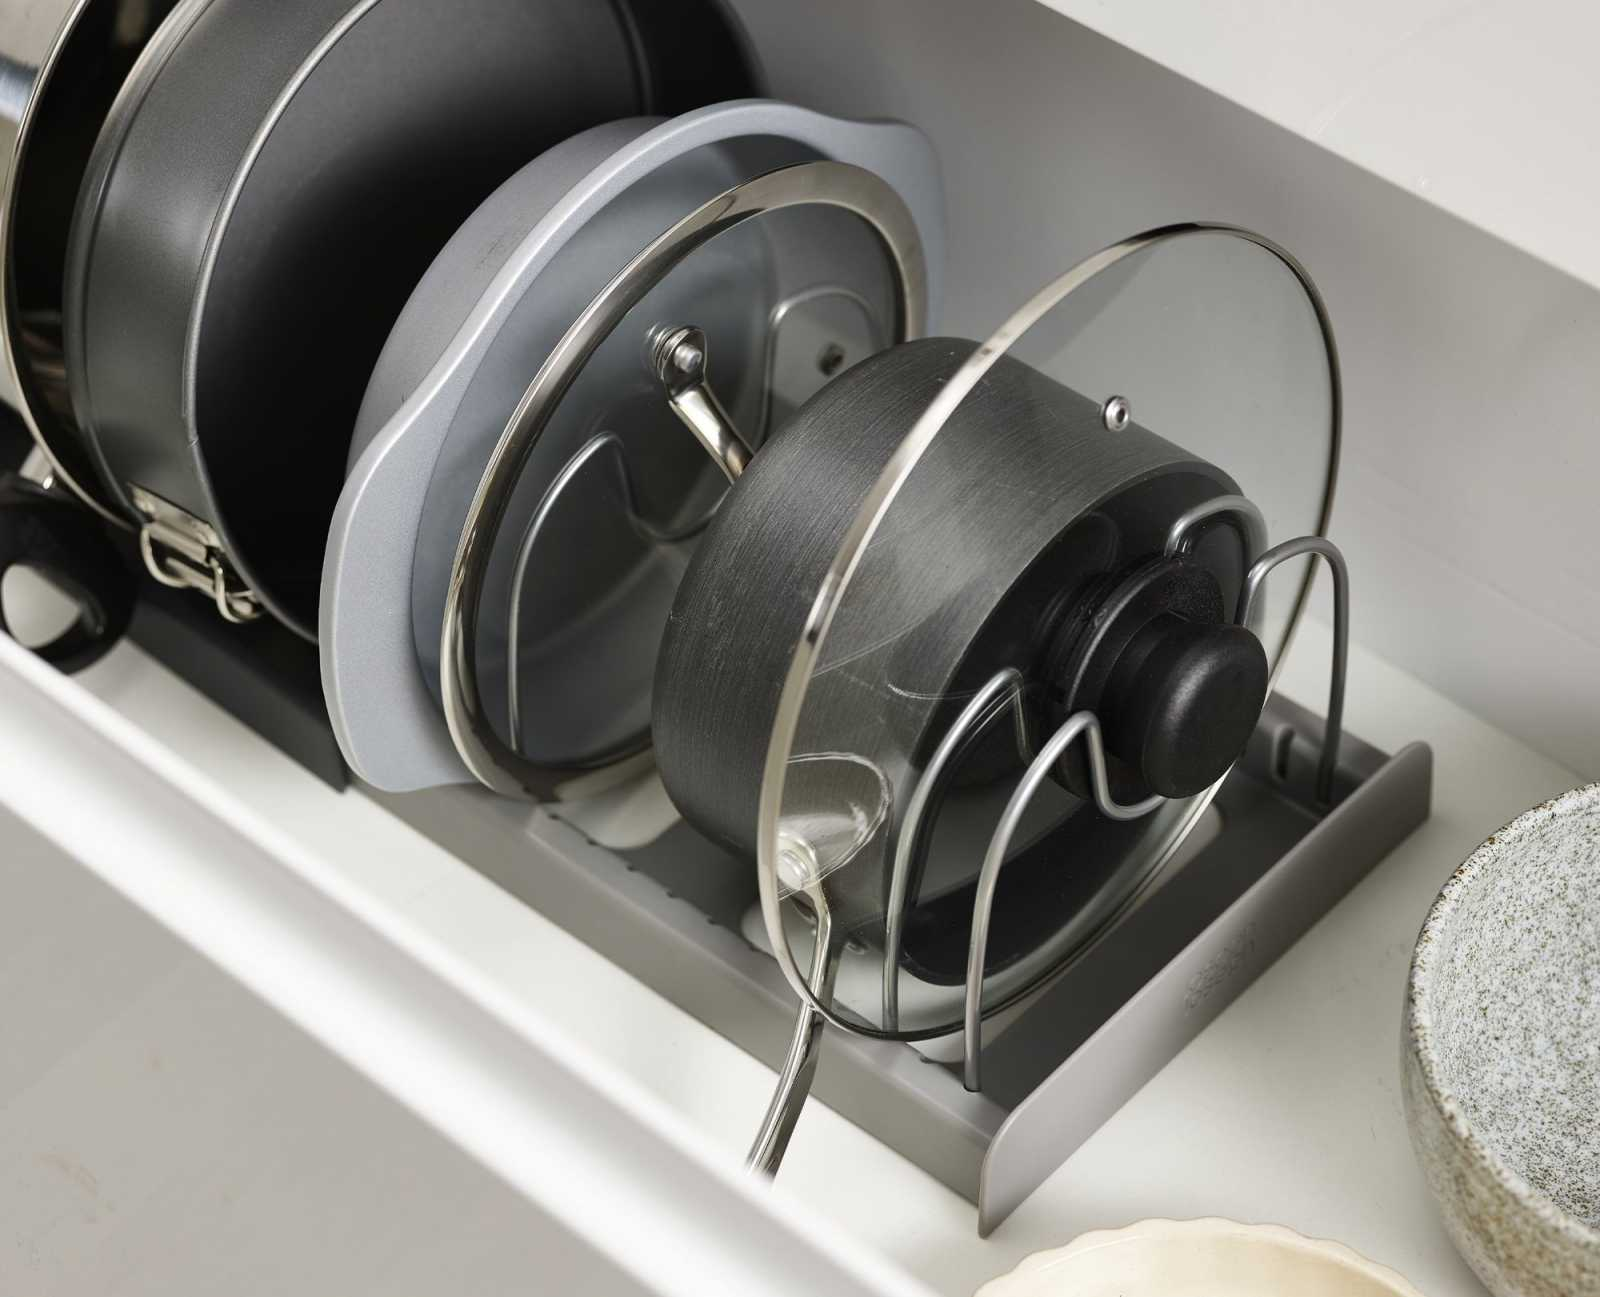 Органайзер для сушки посуды раскладной Joseph Joseph DRAWERSTORE, серый Joseph Joseph 85167 фото 2